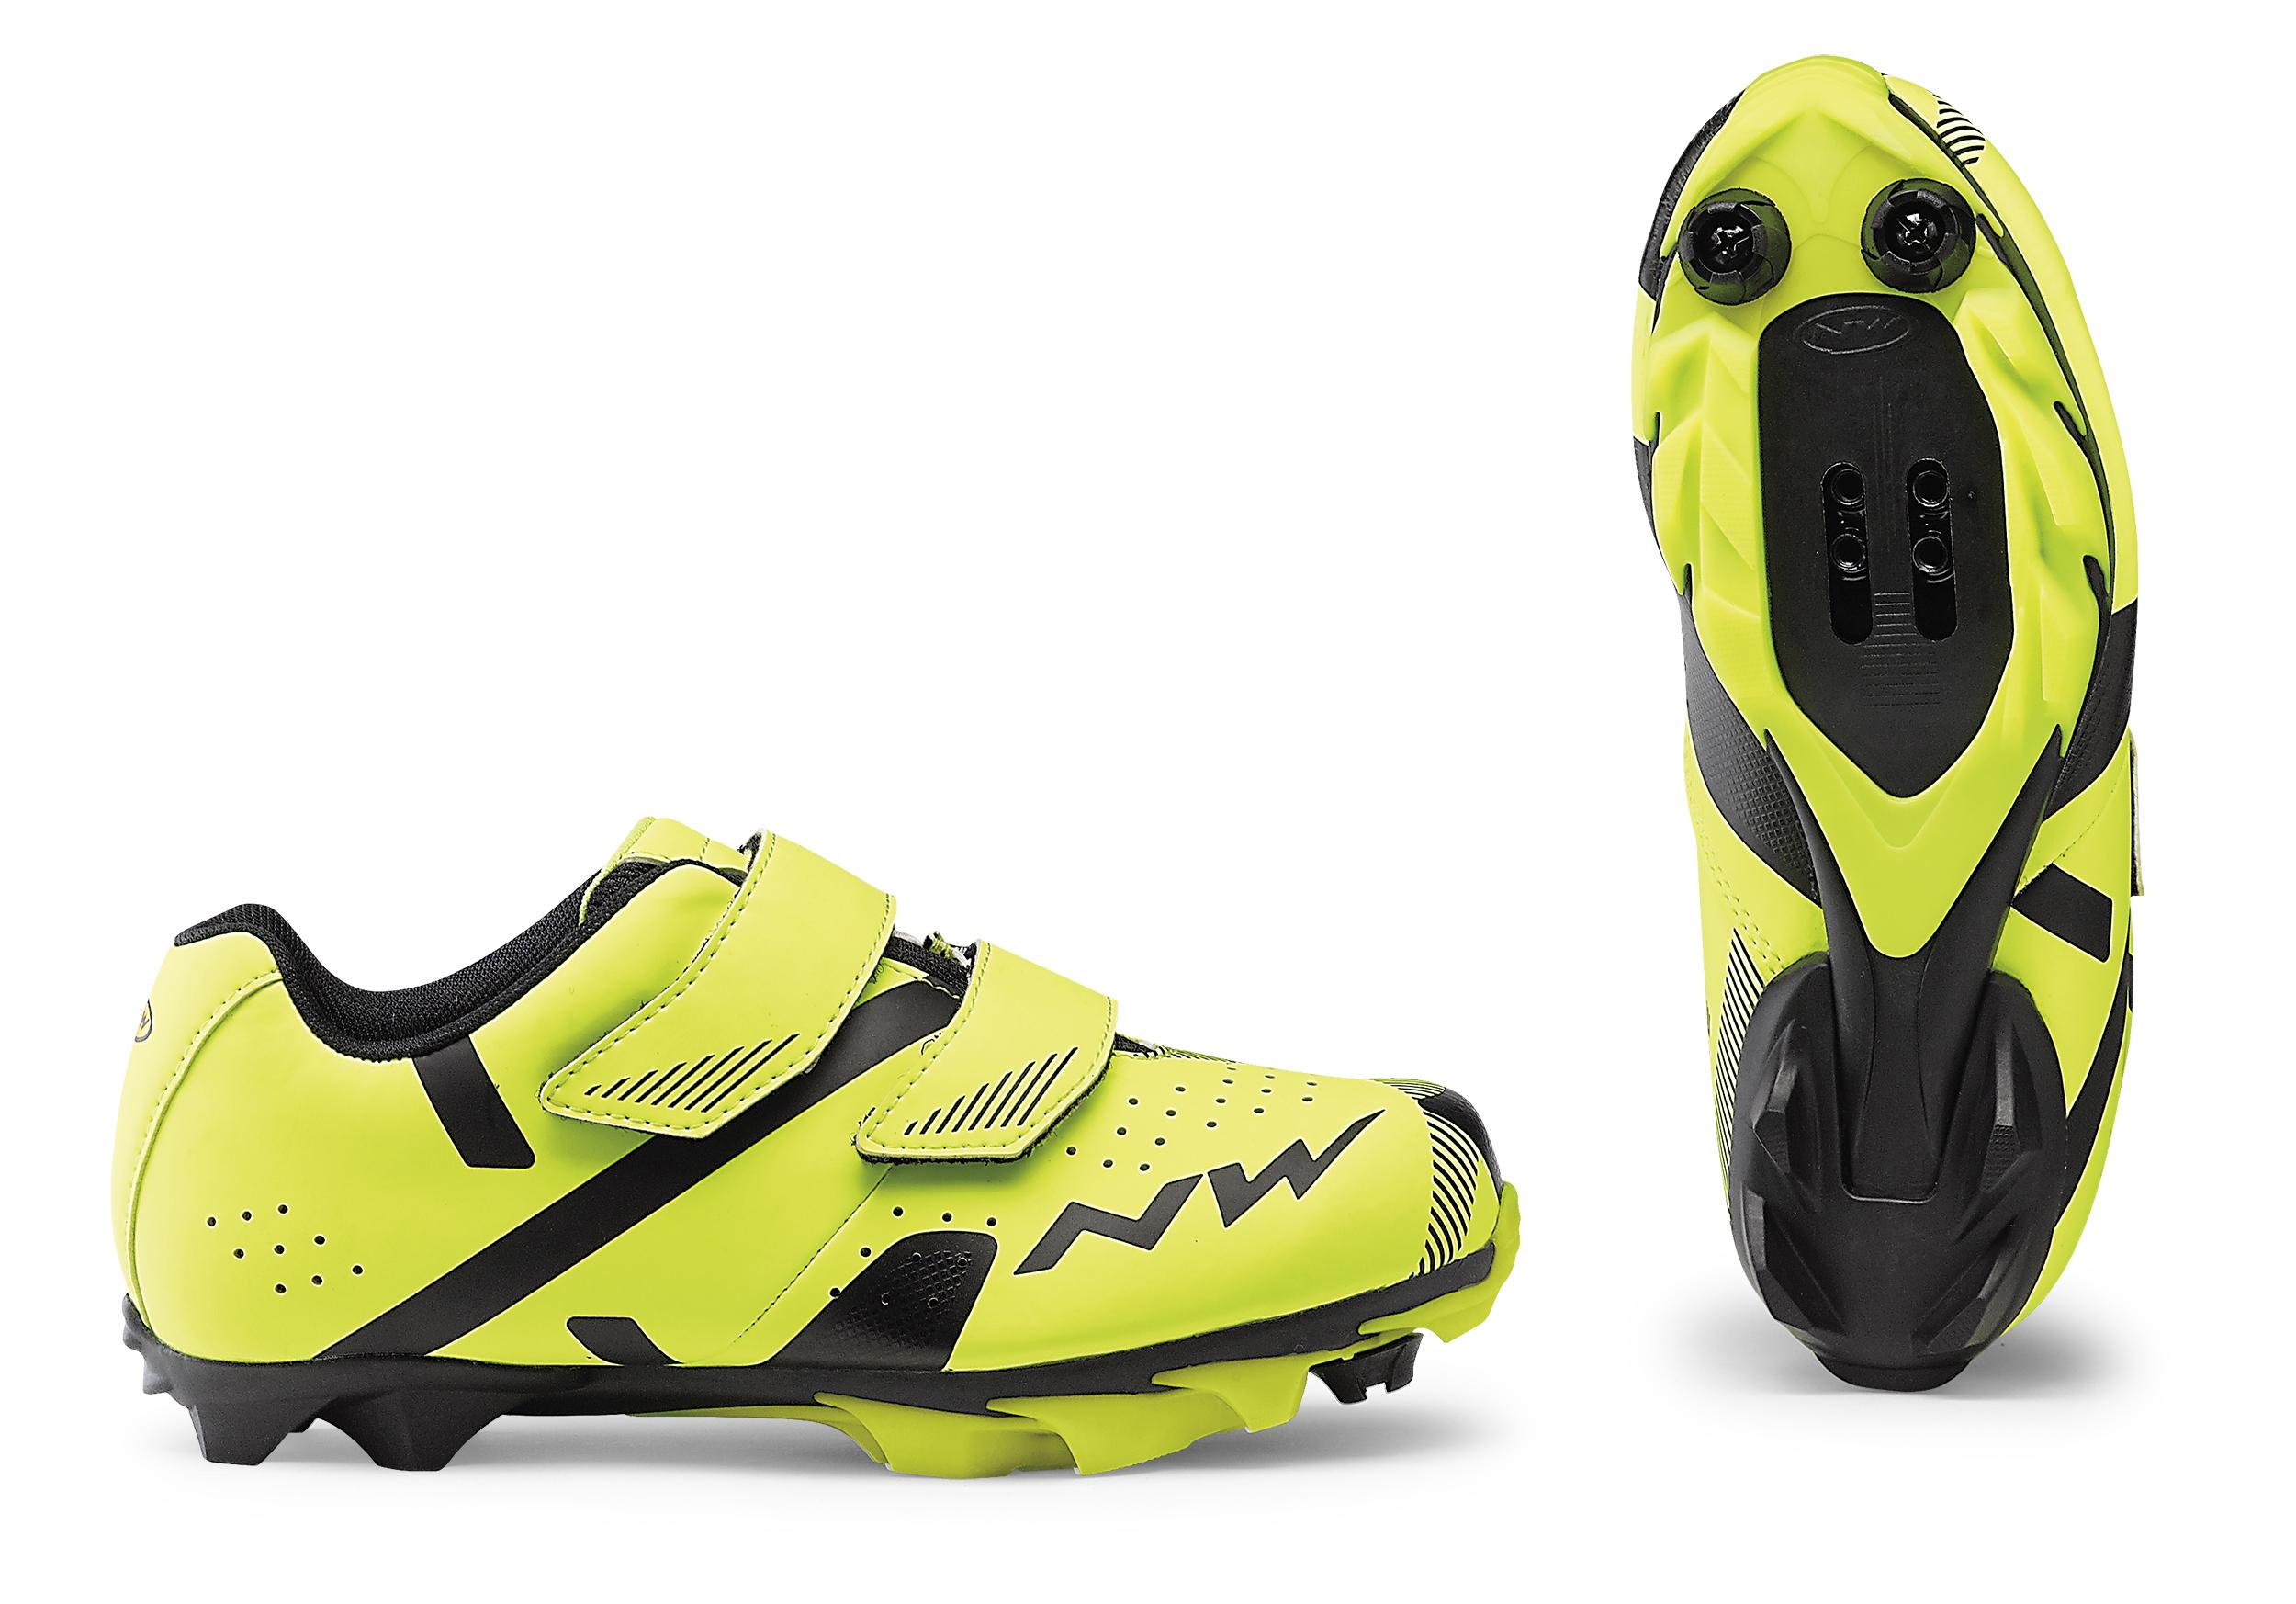 Cipő NORTHWAVE MTB HAMMER 2 JUNIOR 34 fluo sárga-fekete